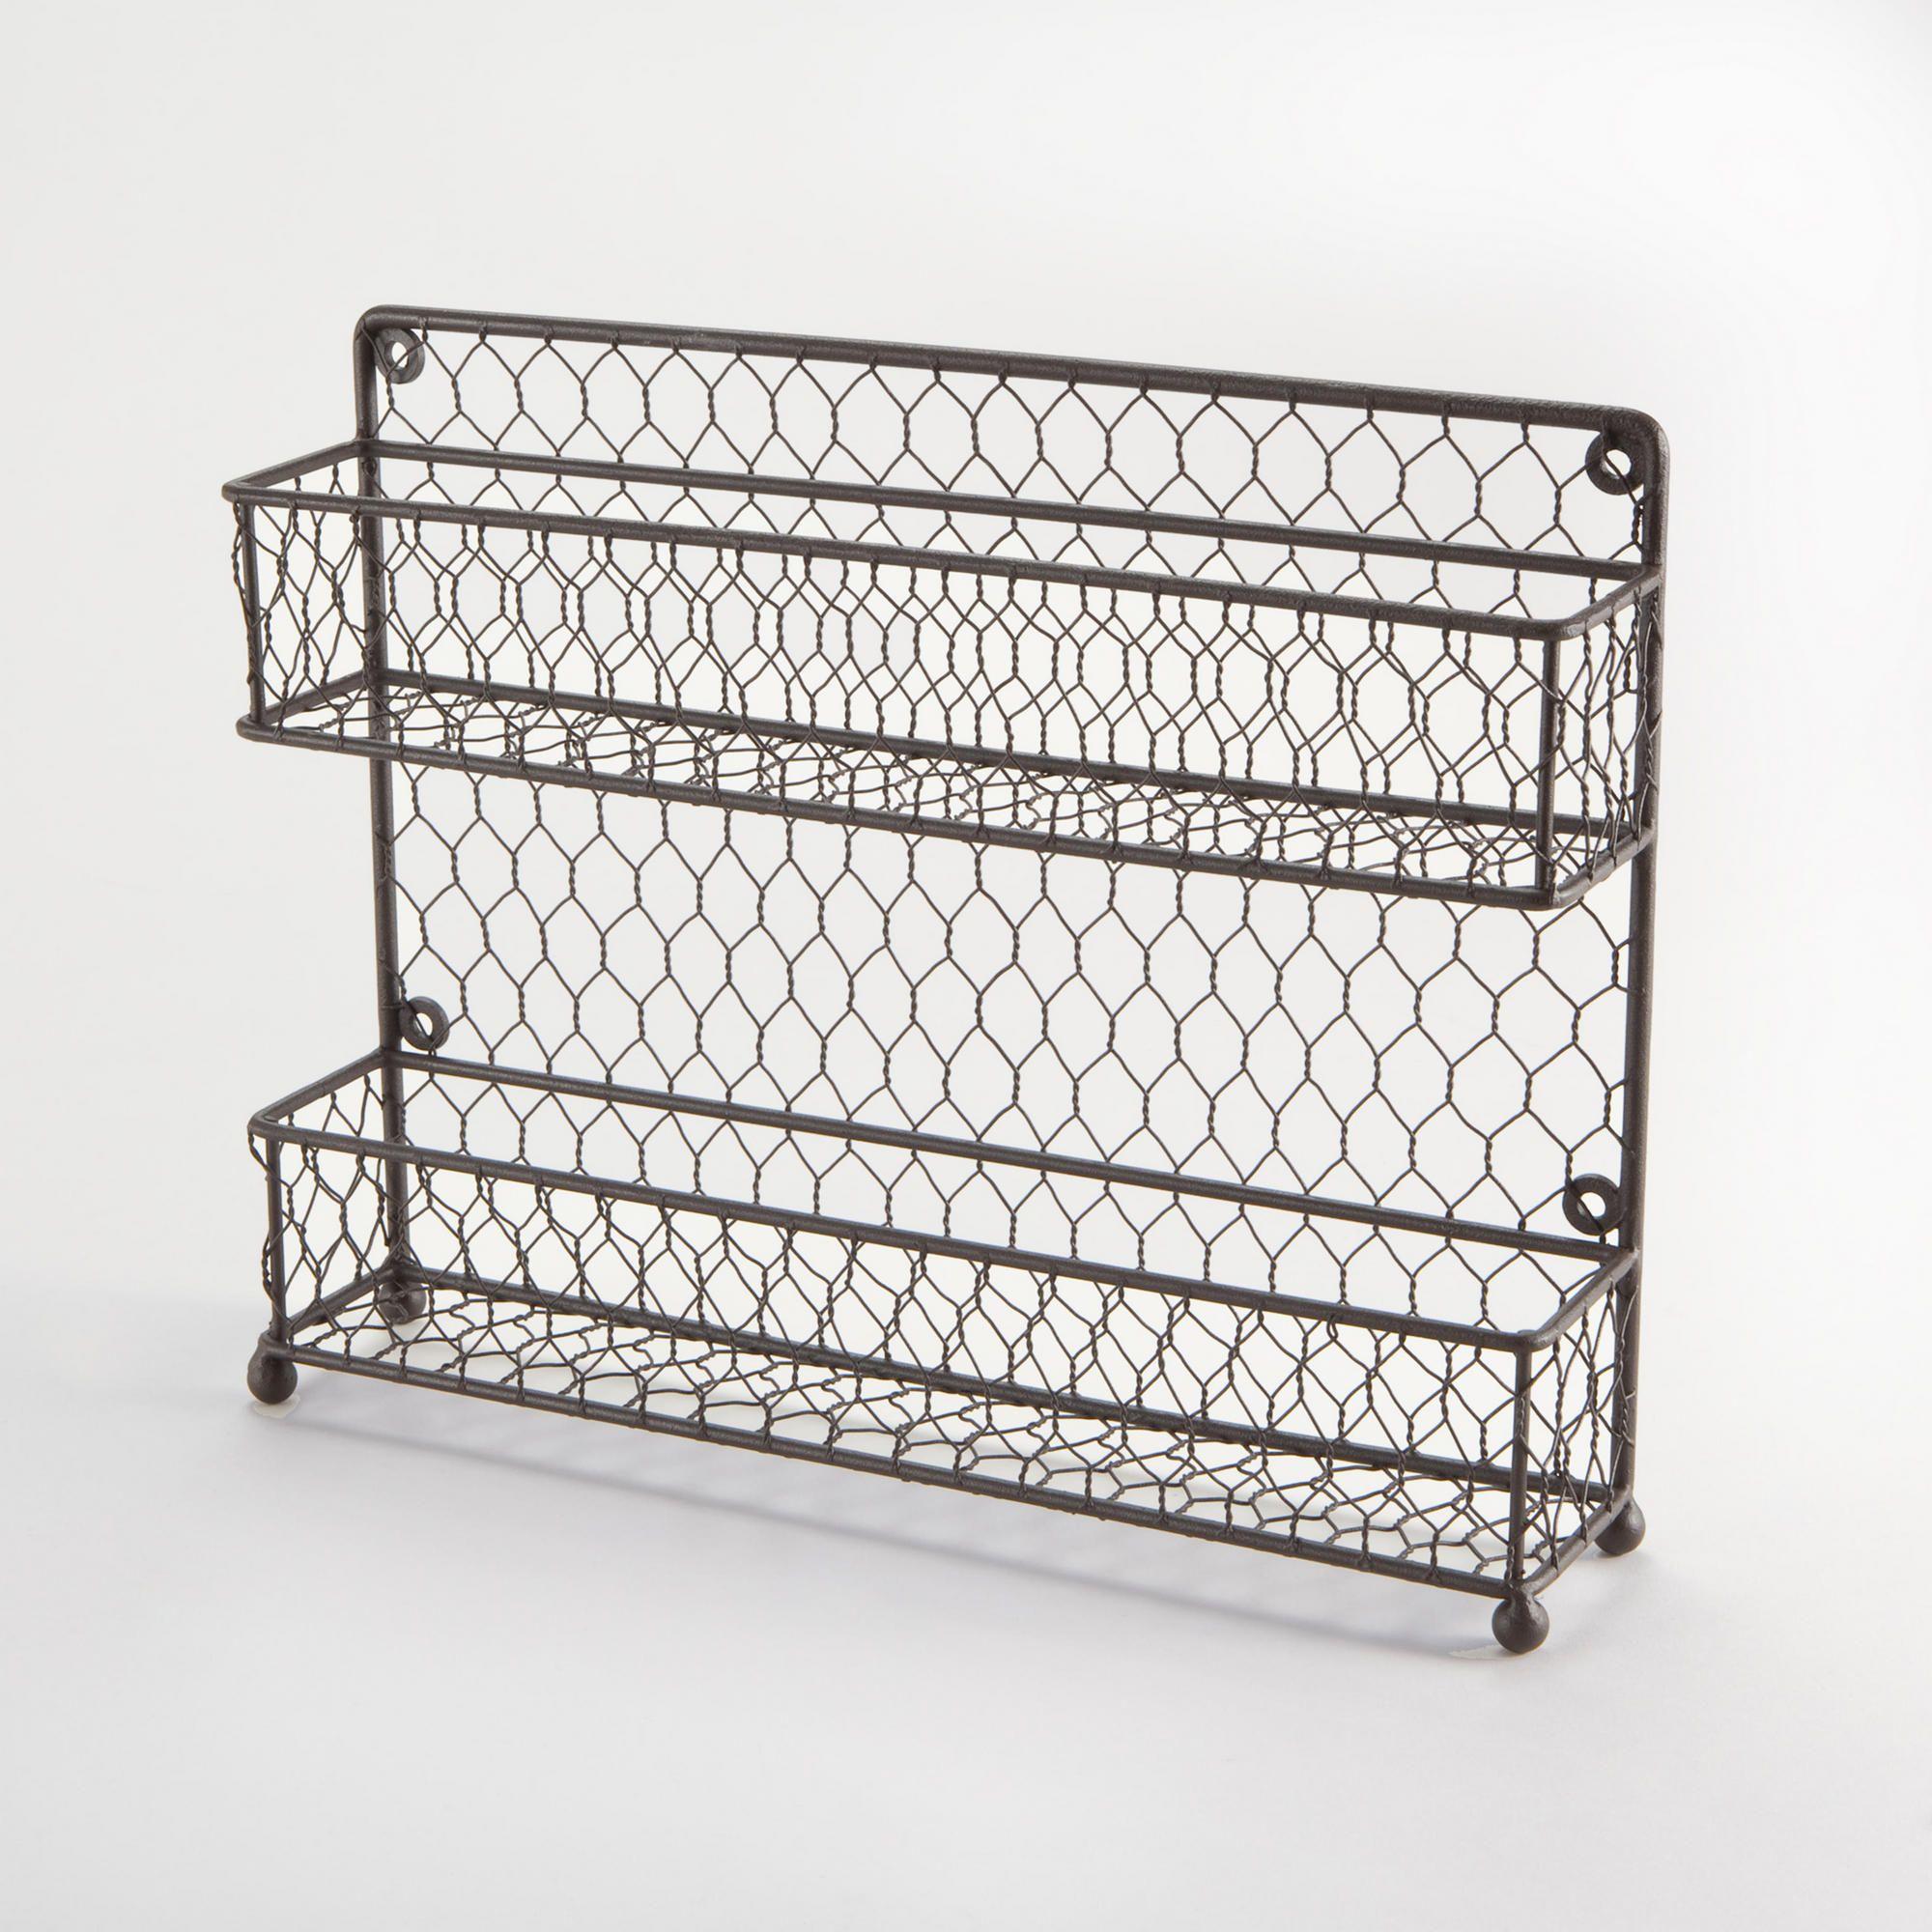 Two-Tier Wire Spice Rack | World Market... Letter holder, memo board ...